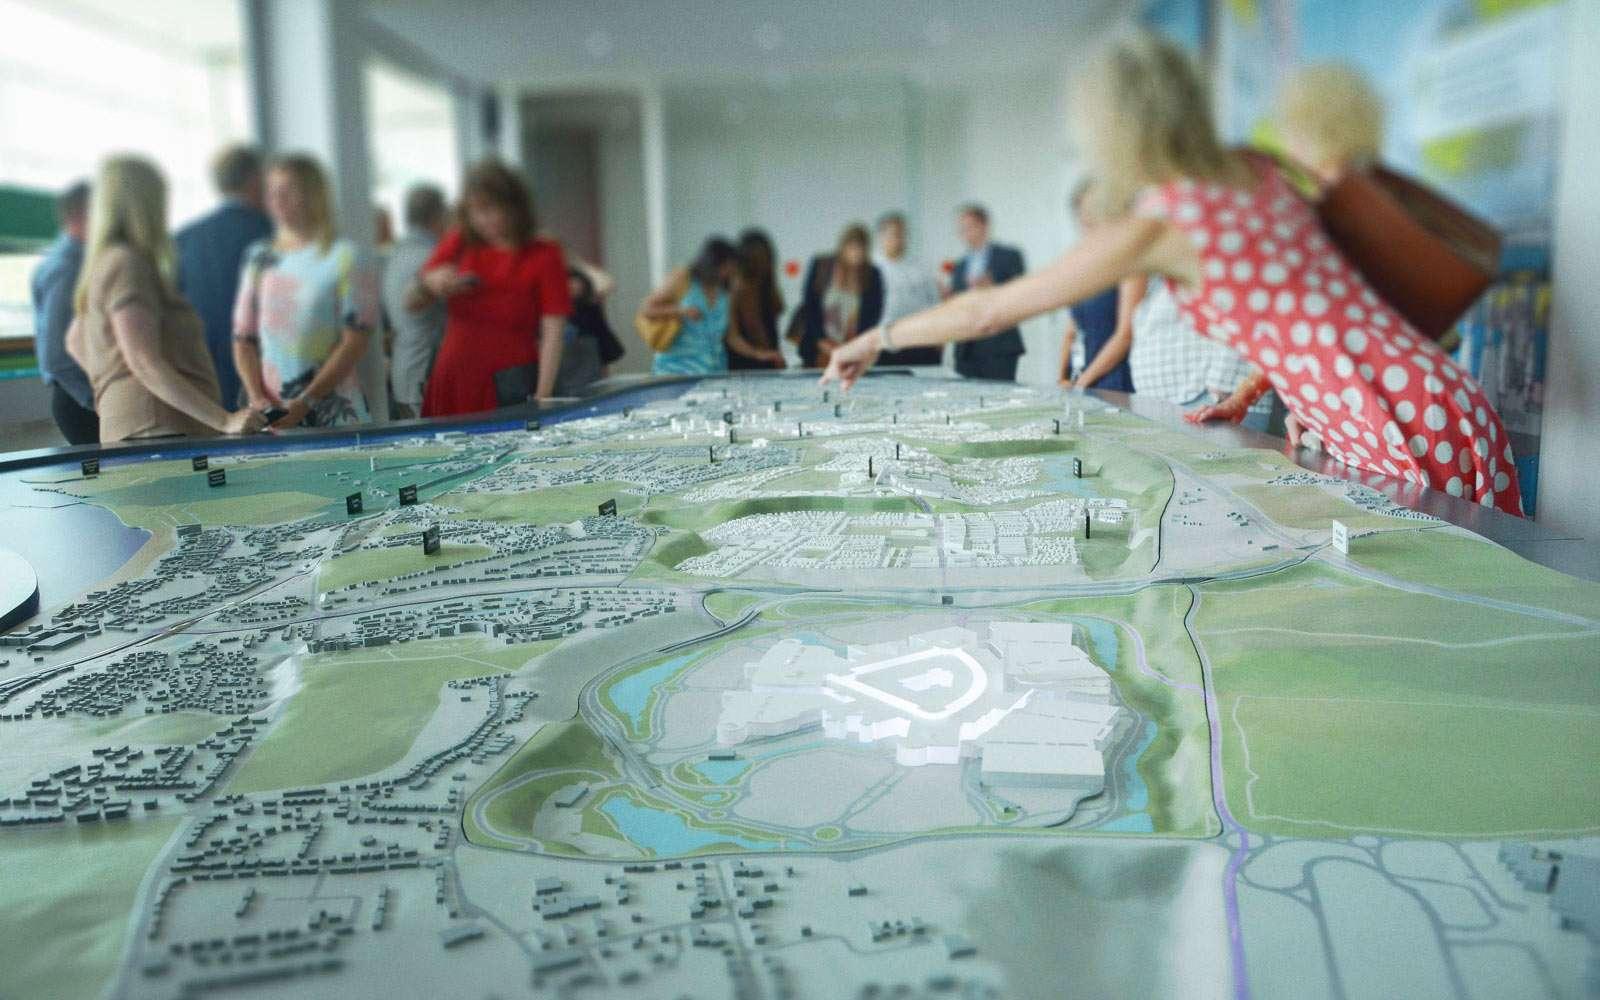 people interacting with Ebbsfleet interactive map